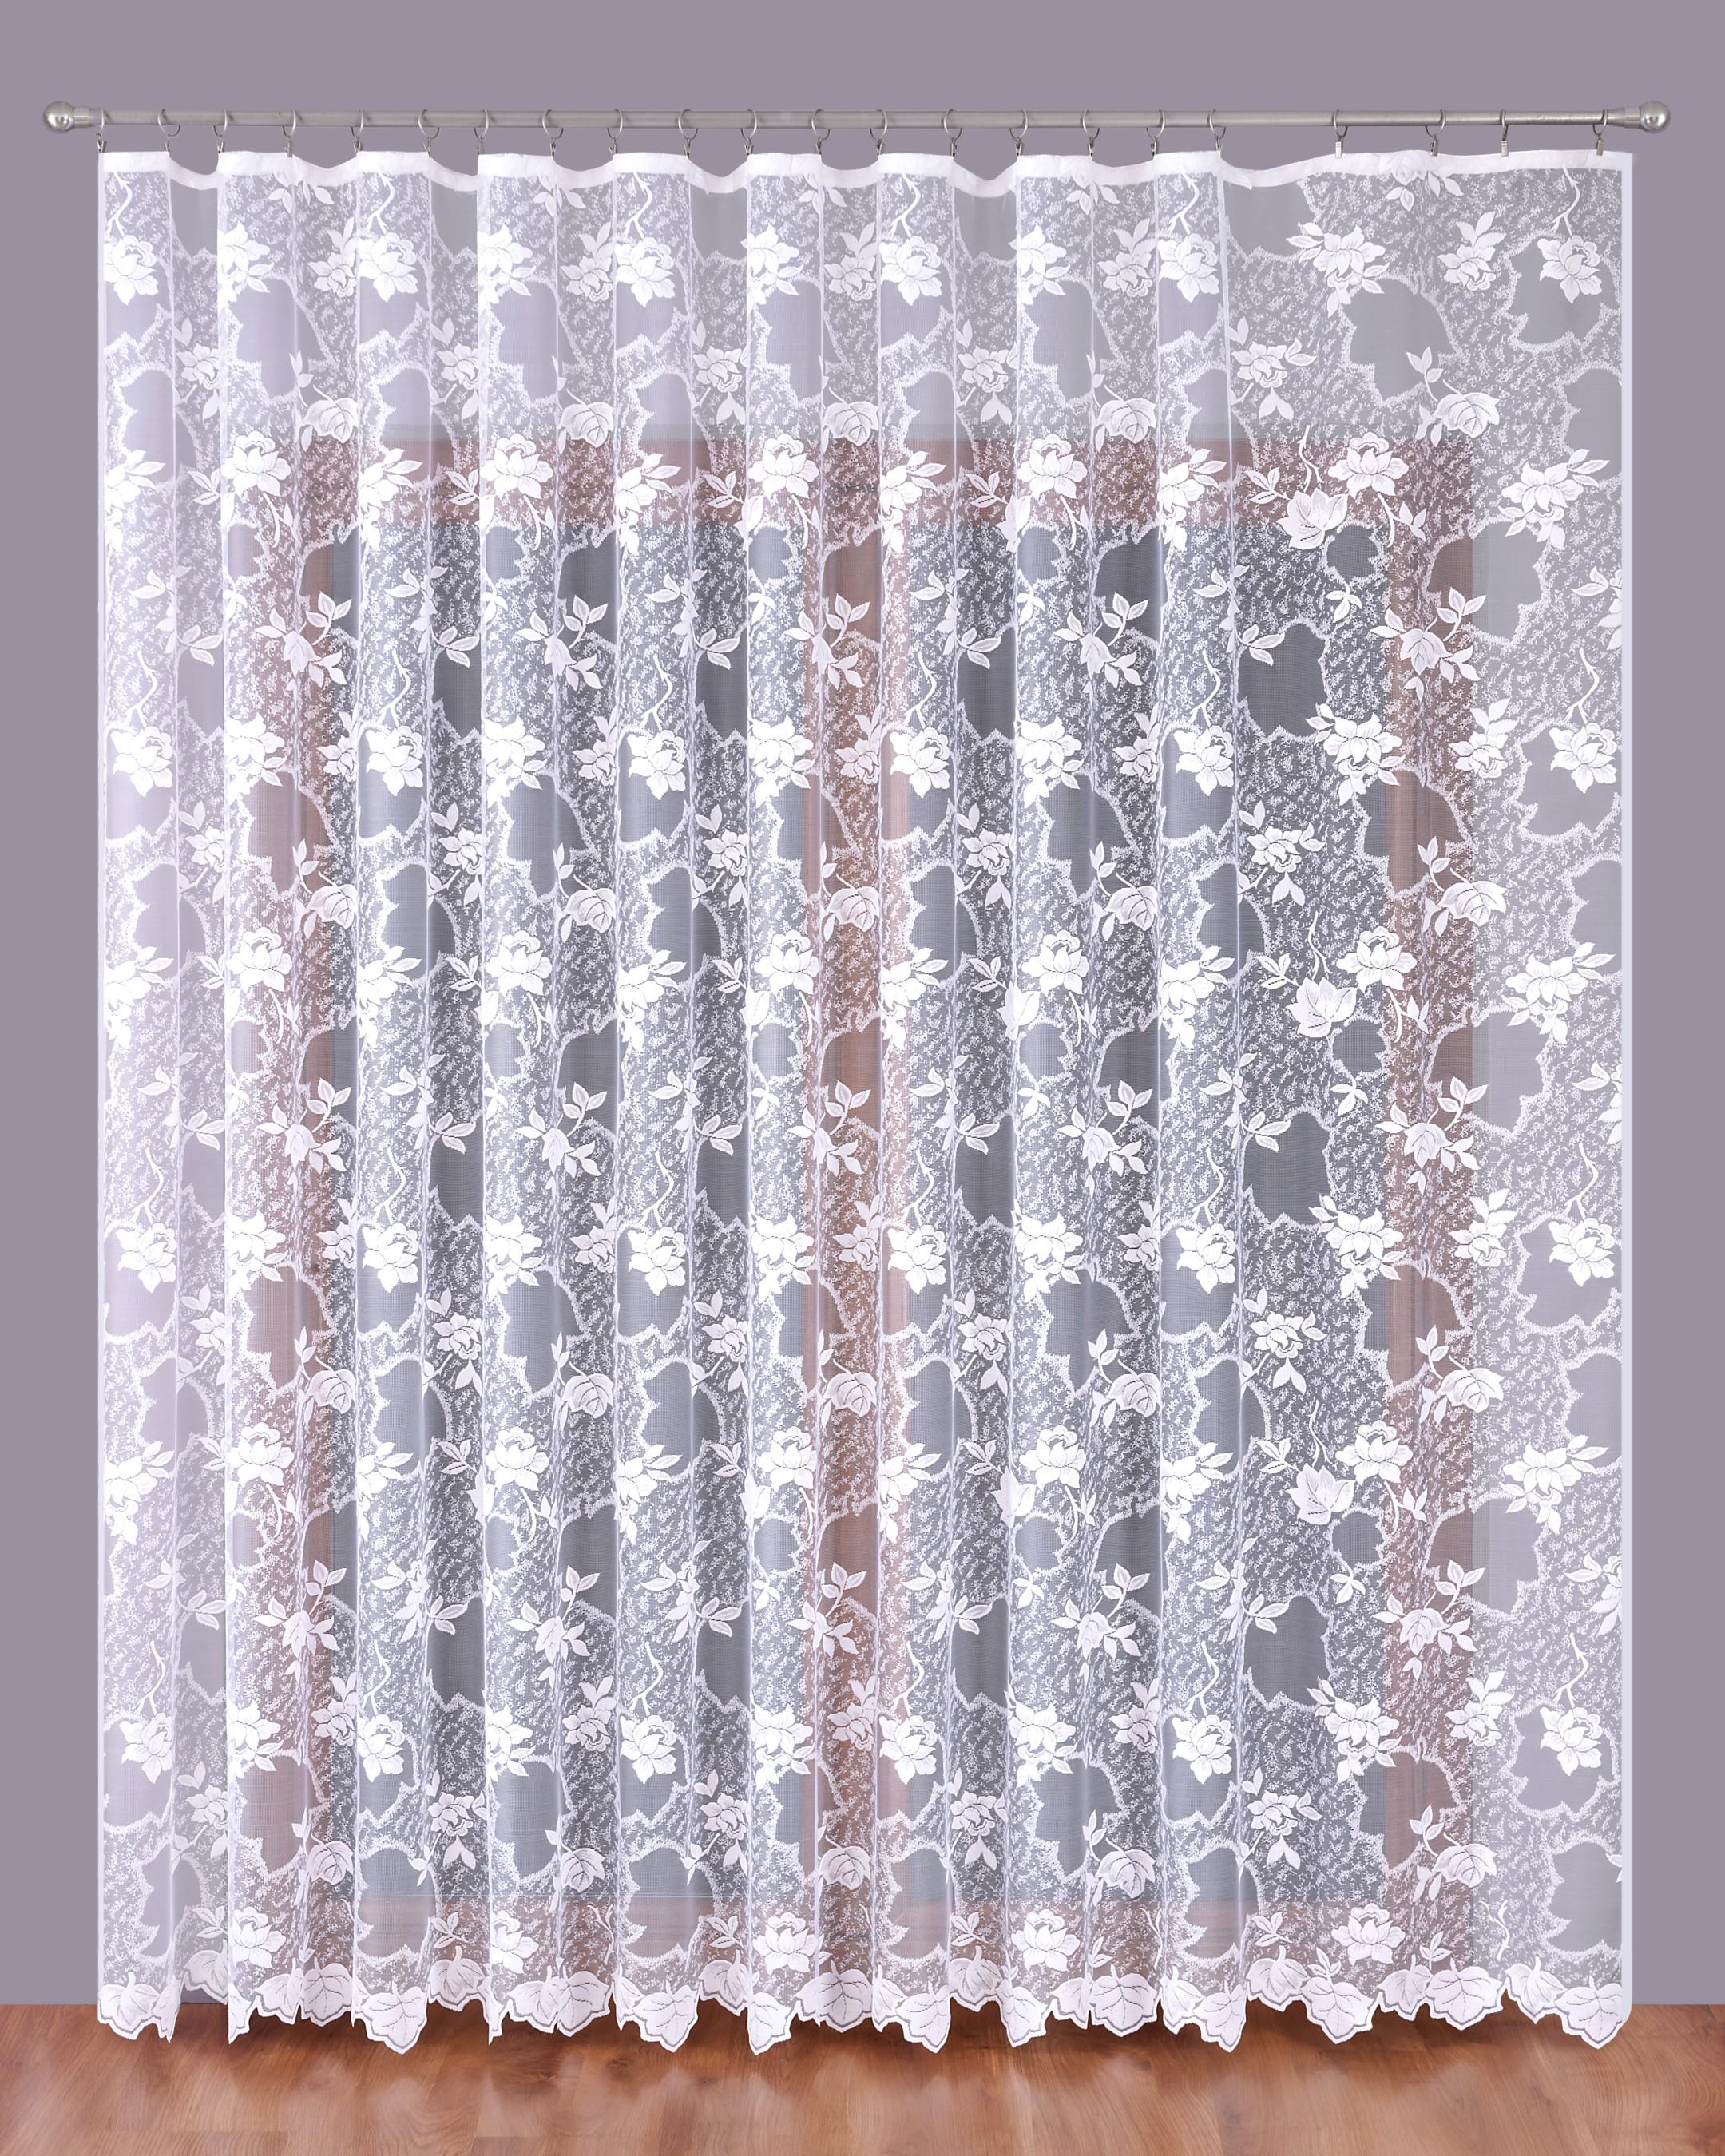 Шторы Primavera Классические шторы Luvinia Цвет: Белый шторы primavera классические шторы caroline цвет сиреневый